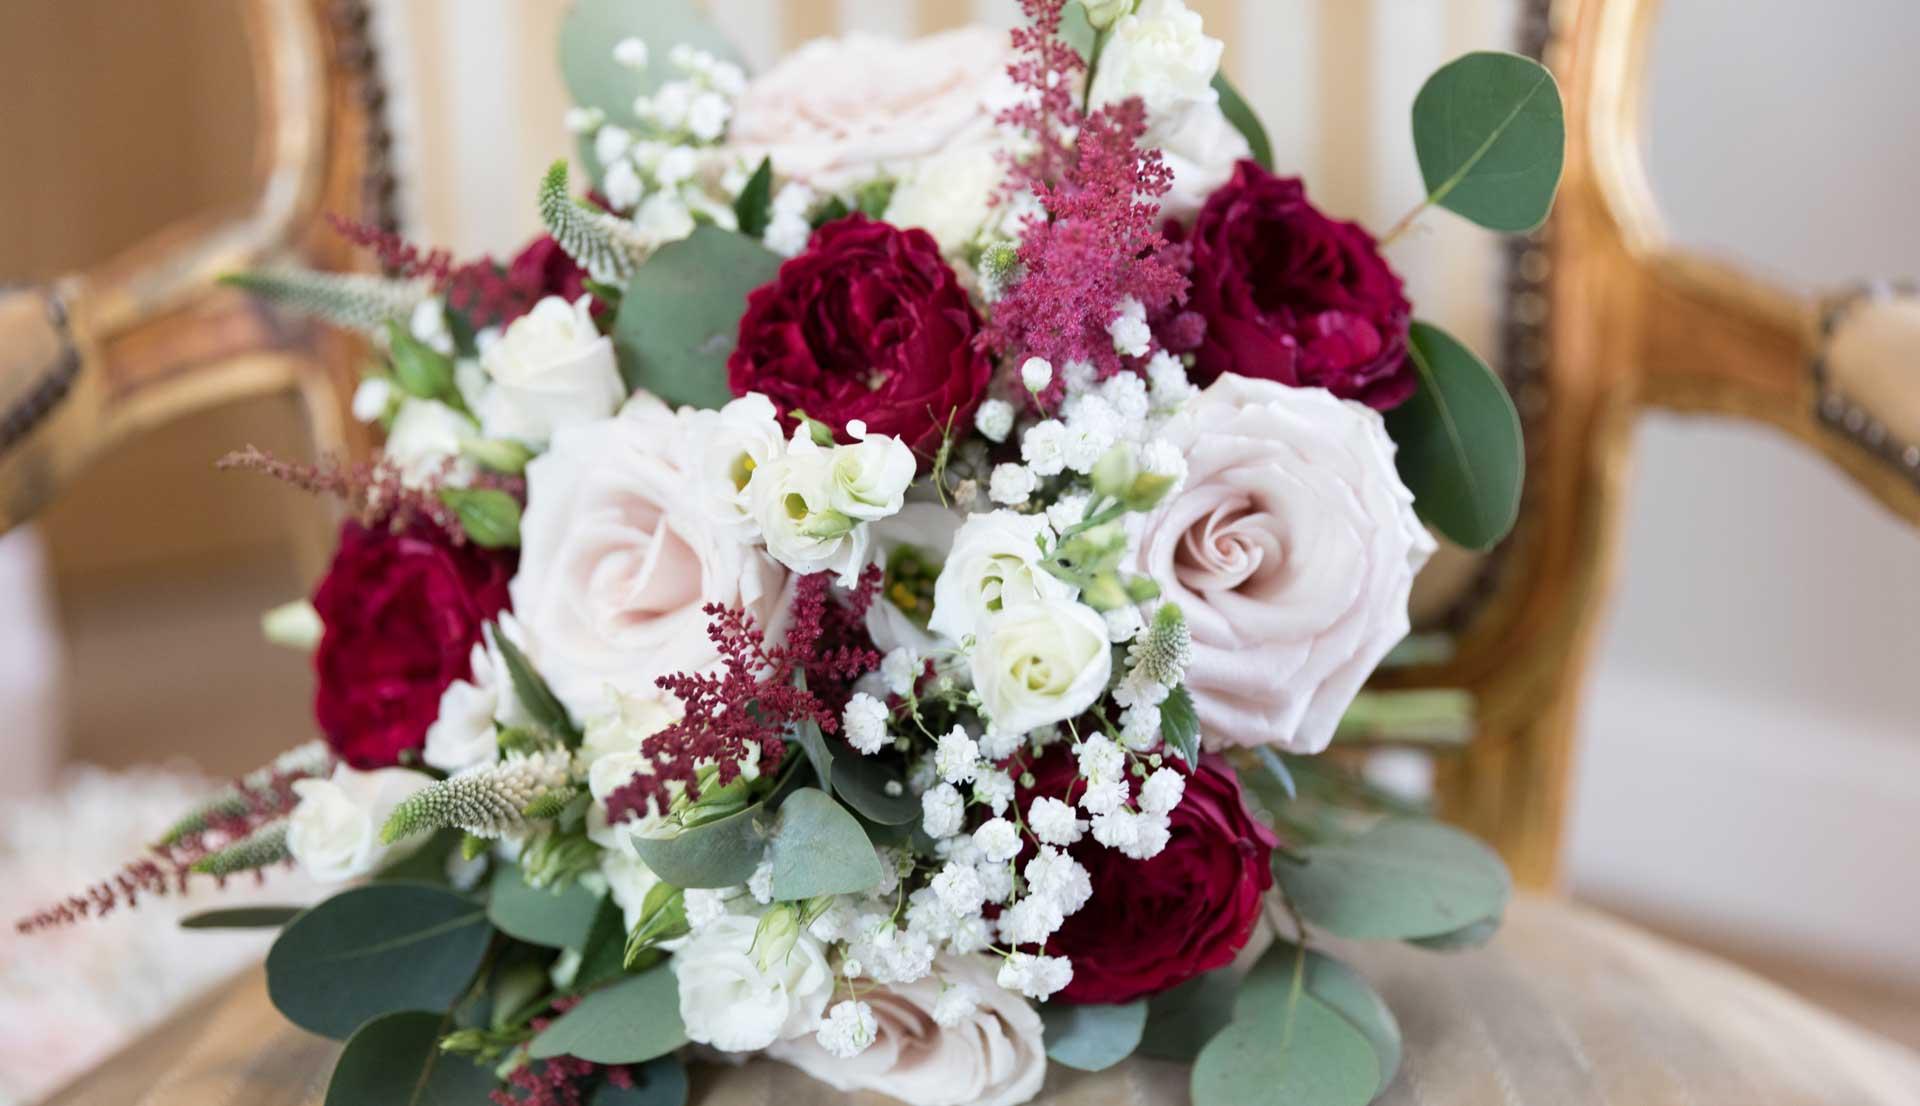 White & burgundy wedding bouquet - Heaven Scent Floral Designs